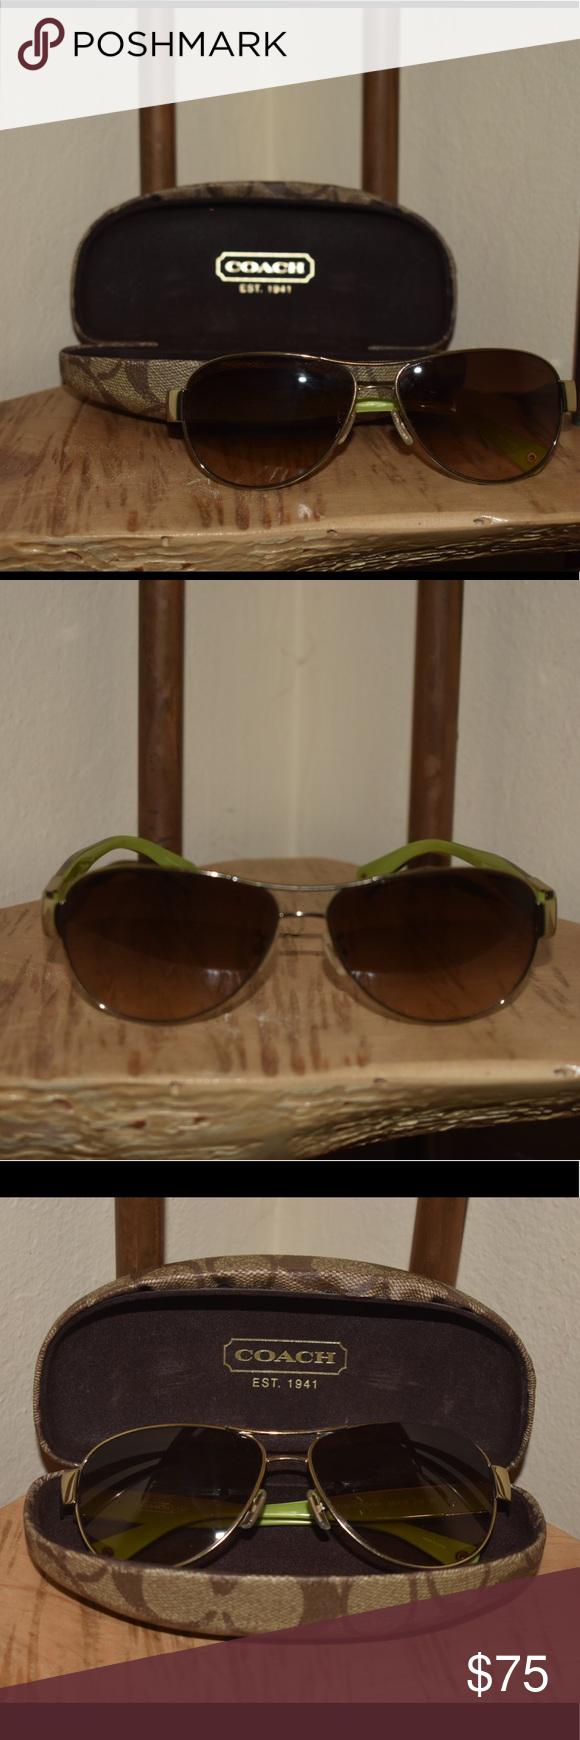 a03bf39ae7 Coach Charity Aviators Coach Charity aviator sunglasses.